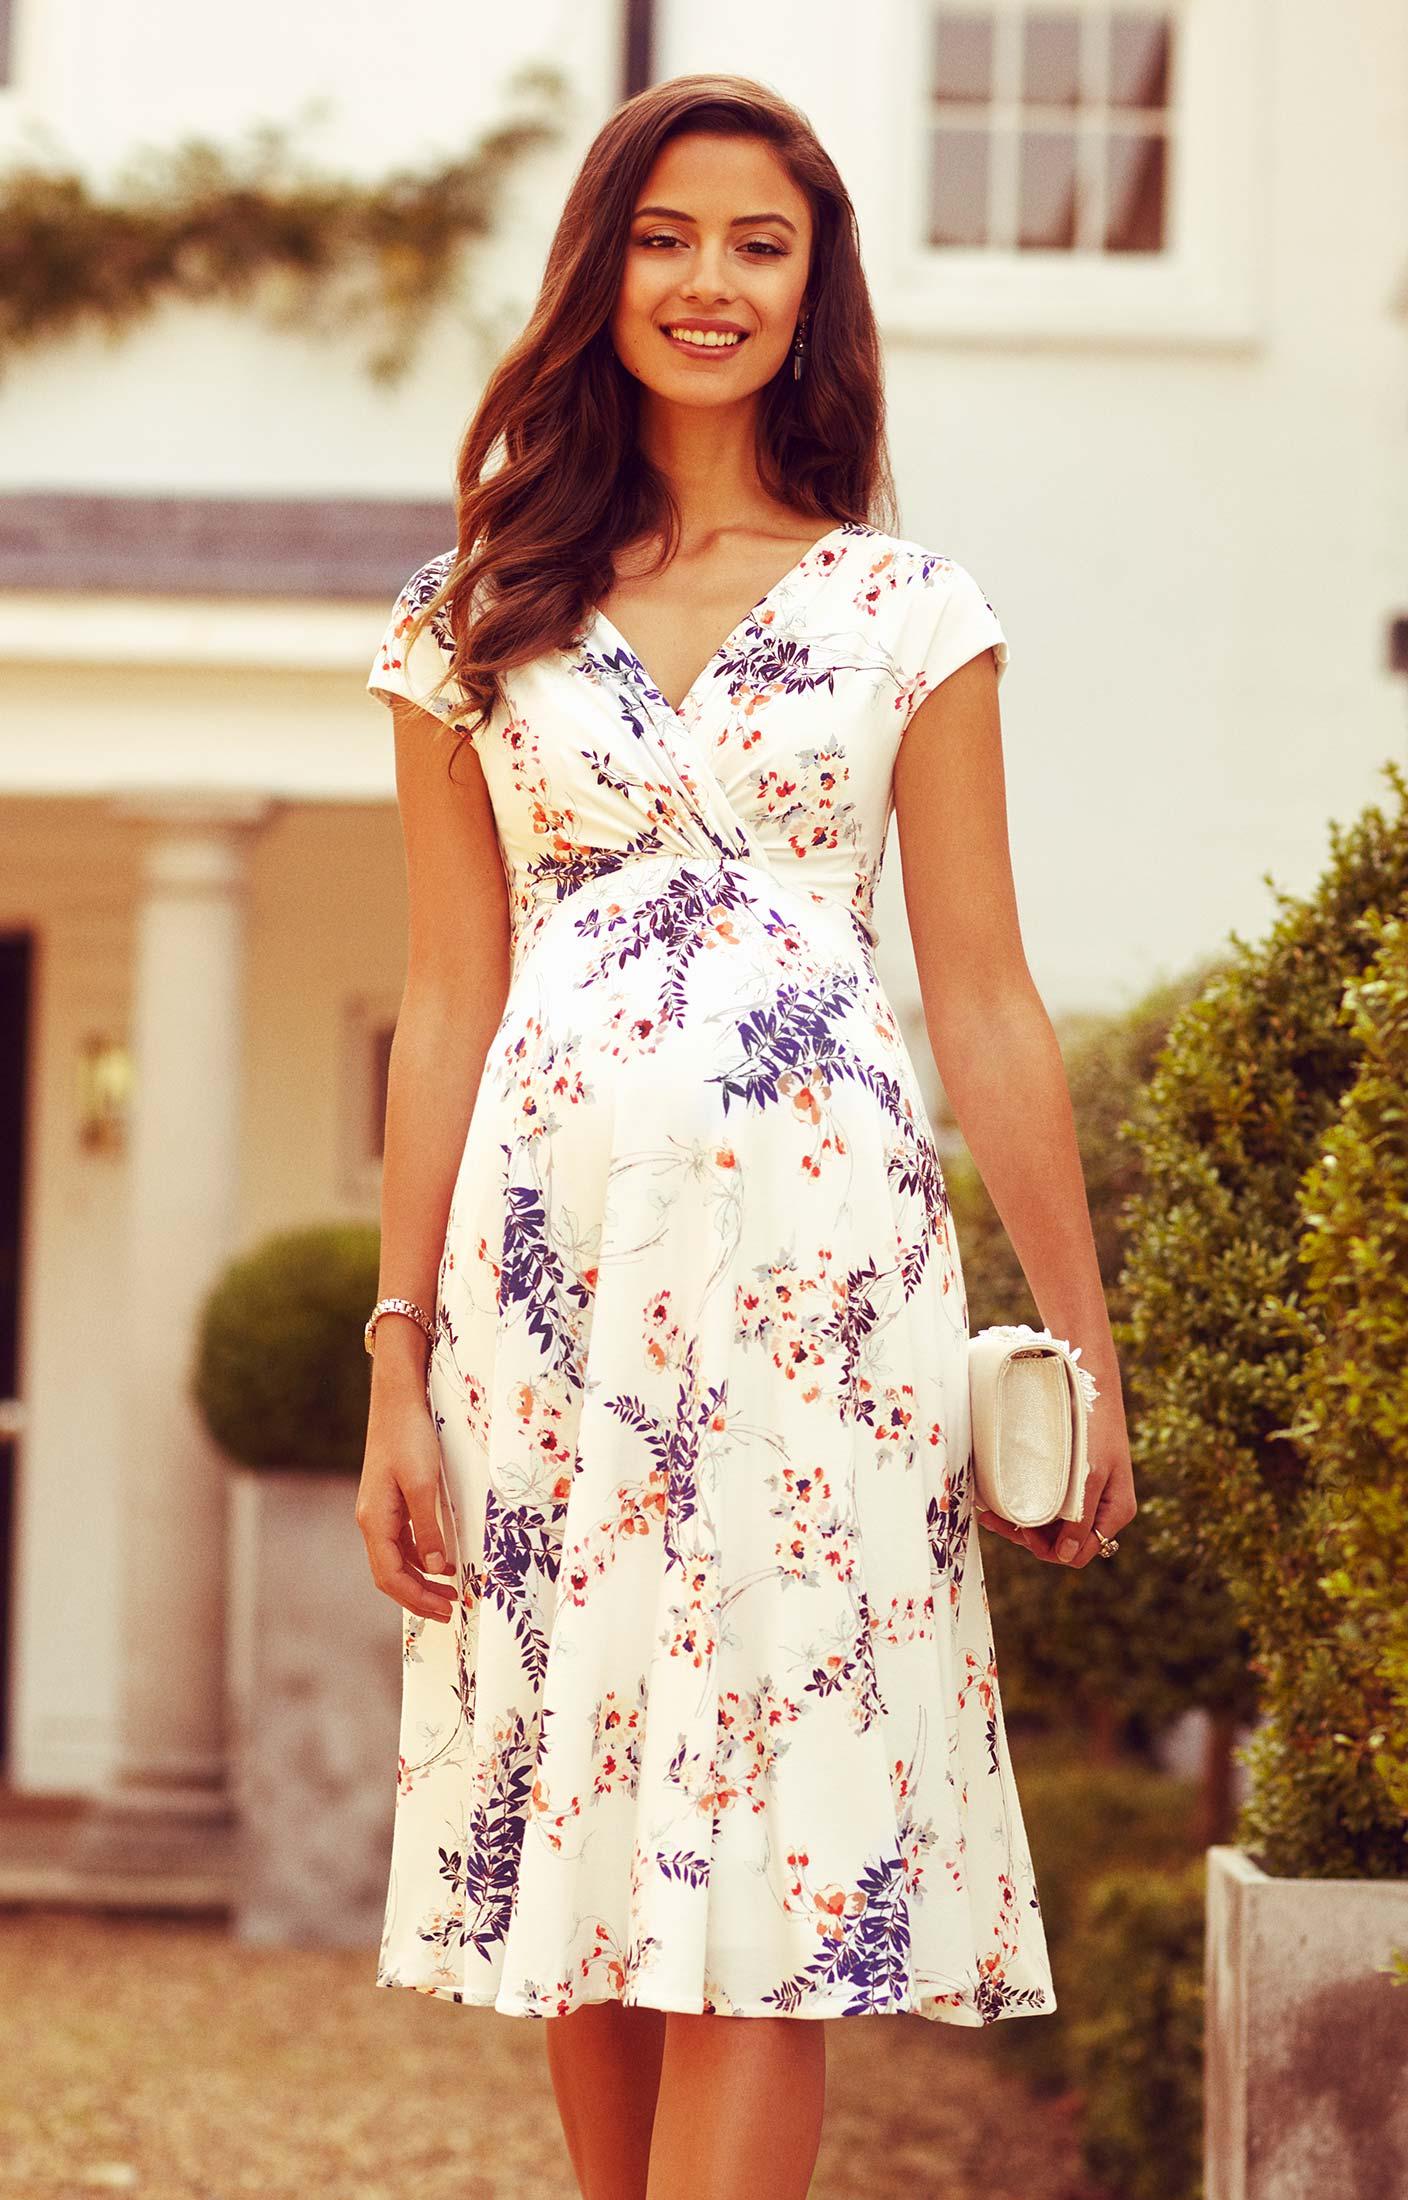 Maternity dresses for weddings  Alessandra Dress  Wedding Guest  Pinterest  Maternity dresses